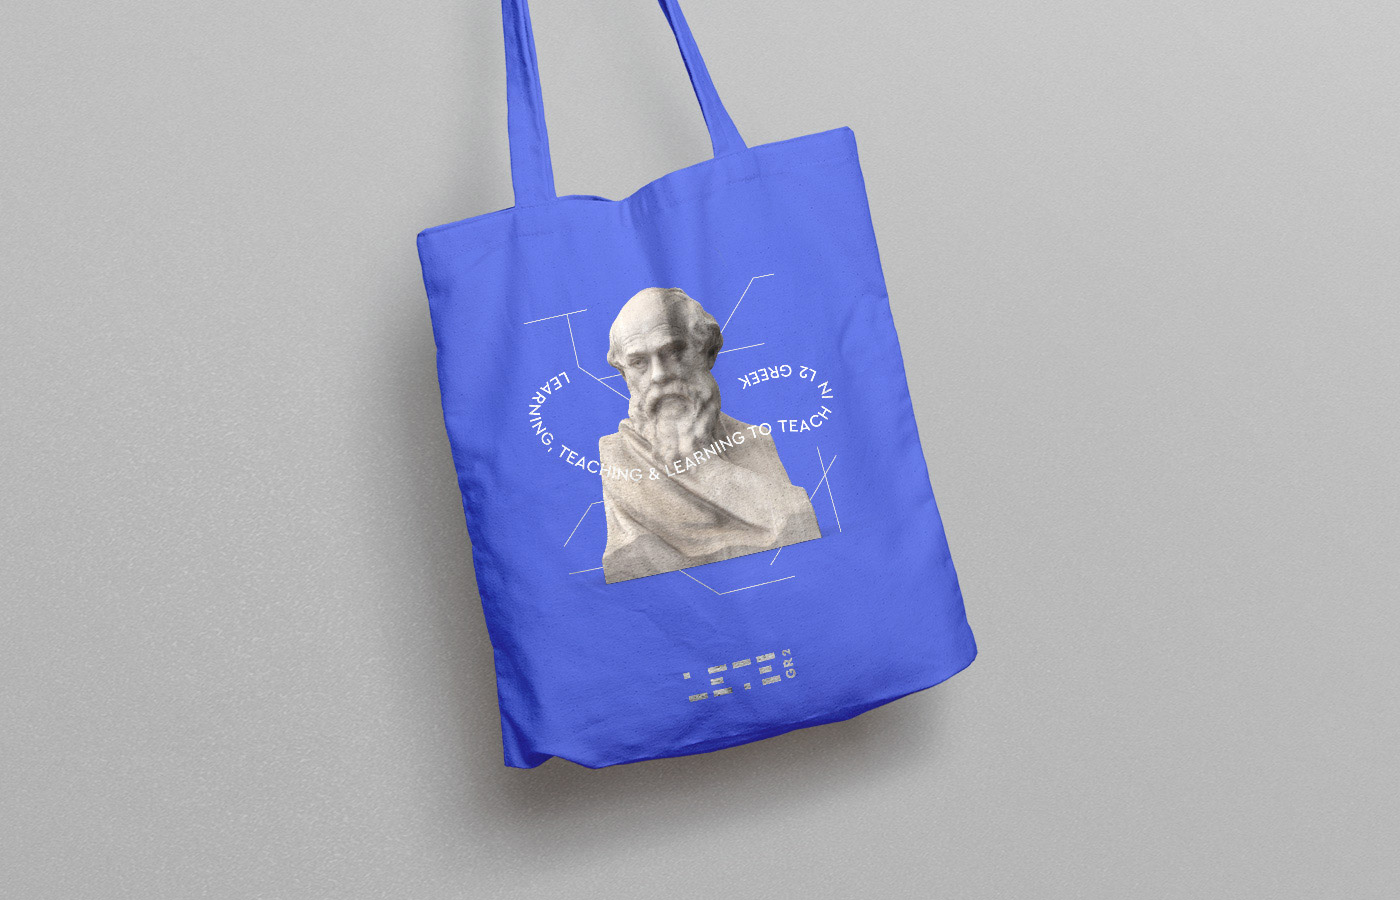 learning teaching greek research university logo design branding stationary cloth linen bag handbag